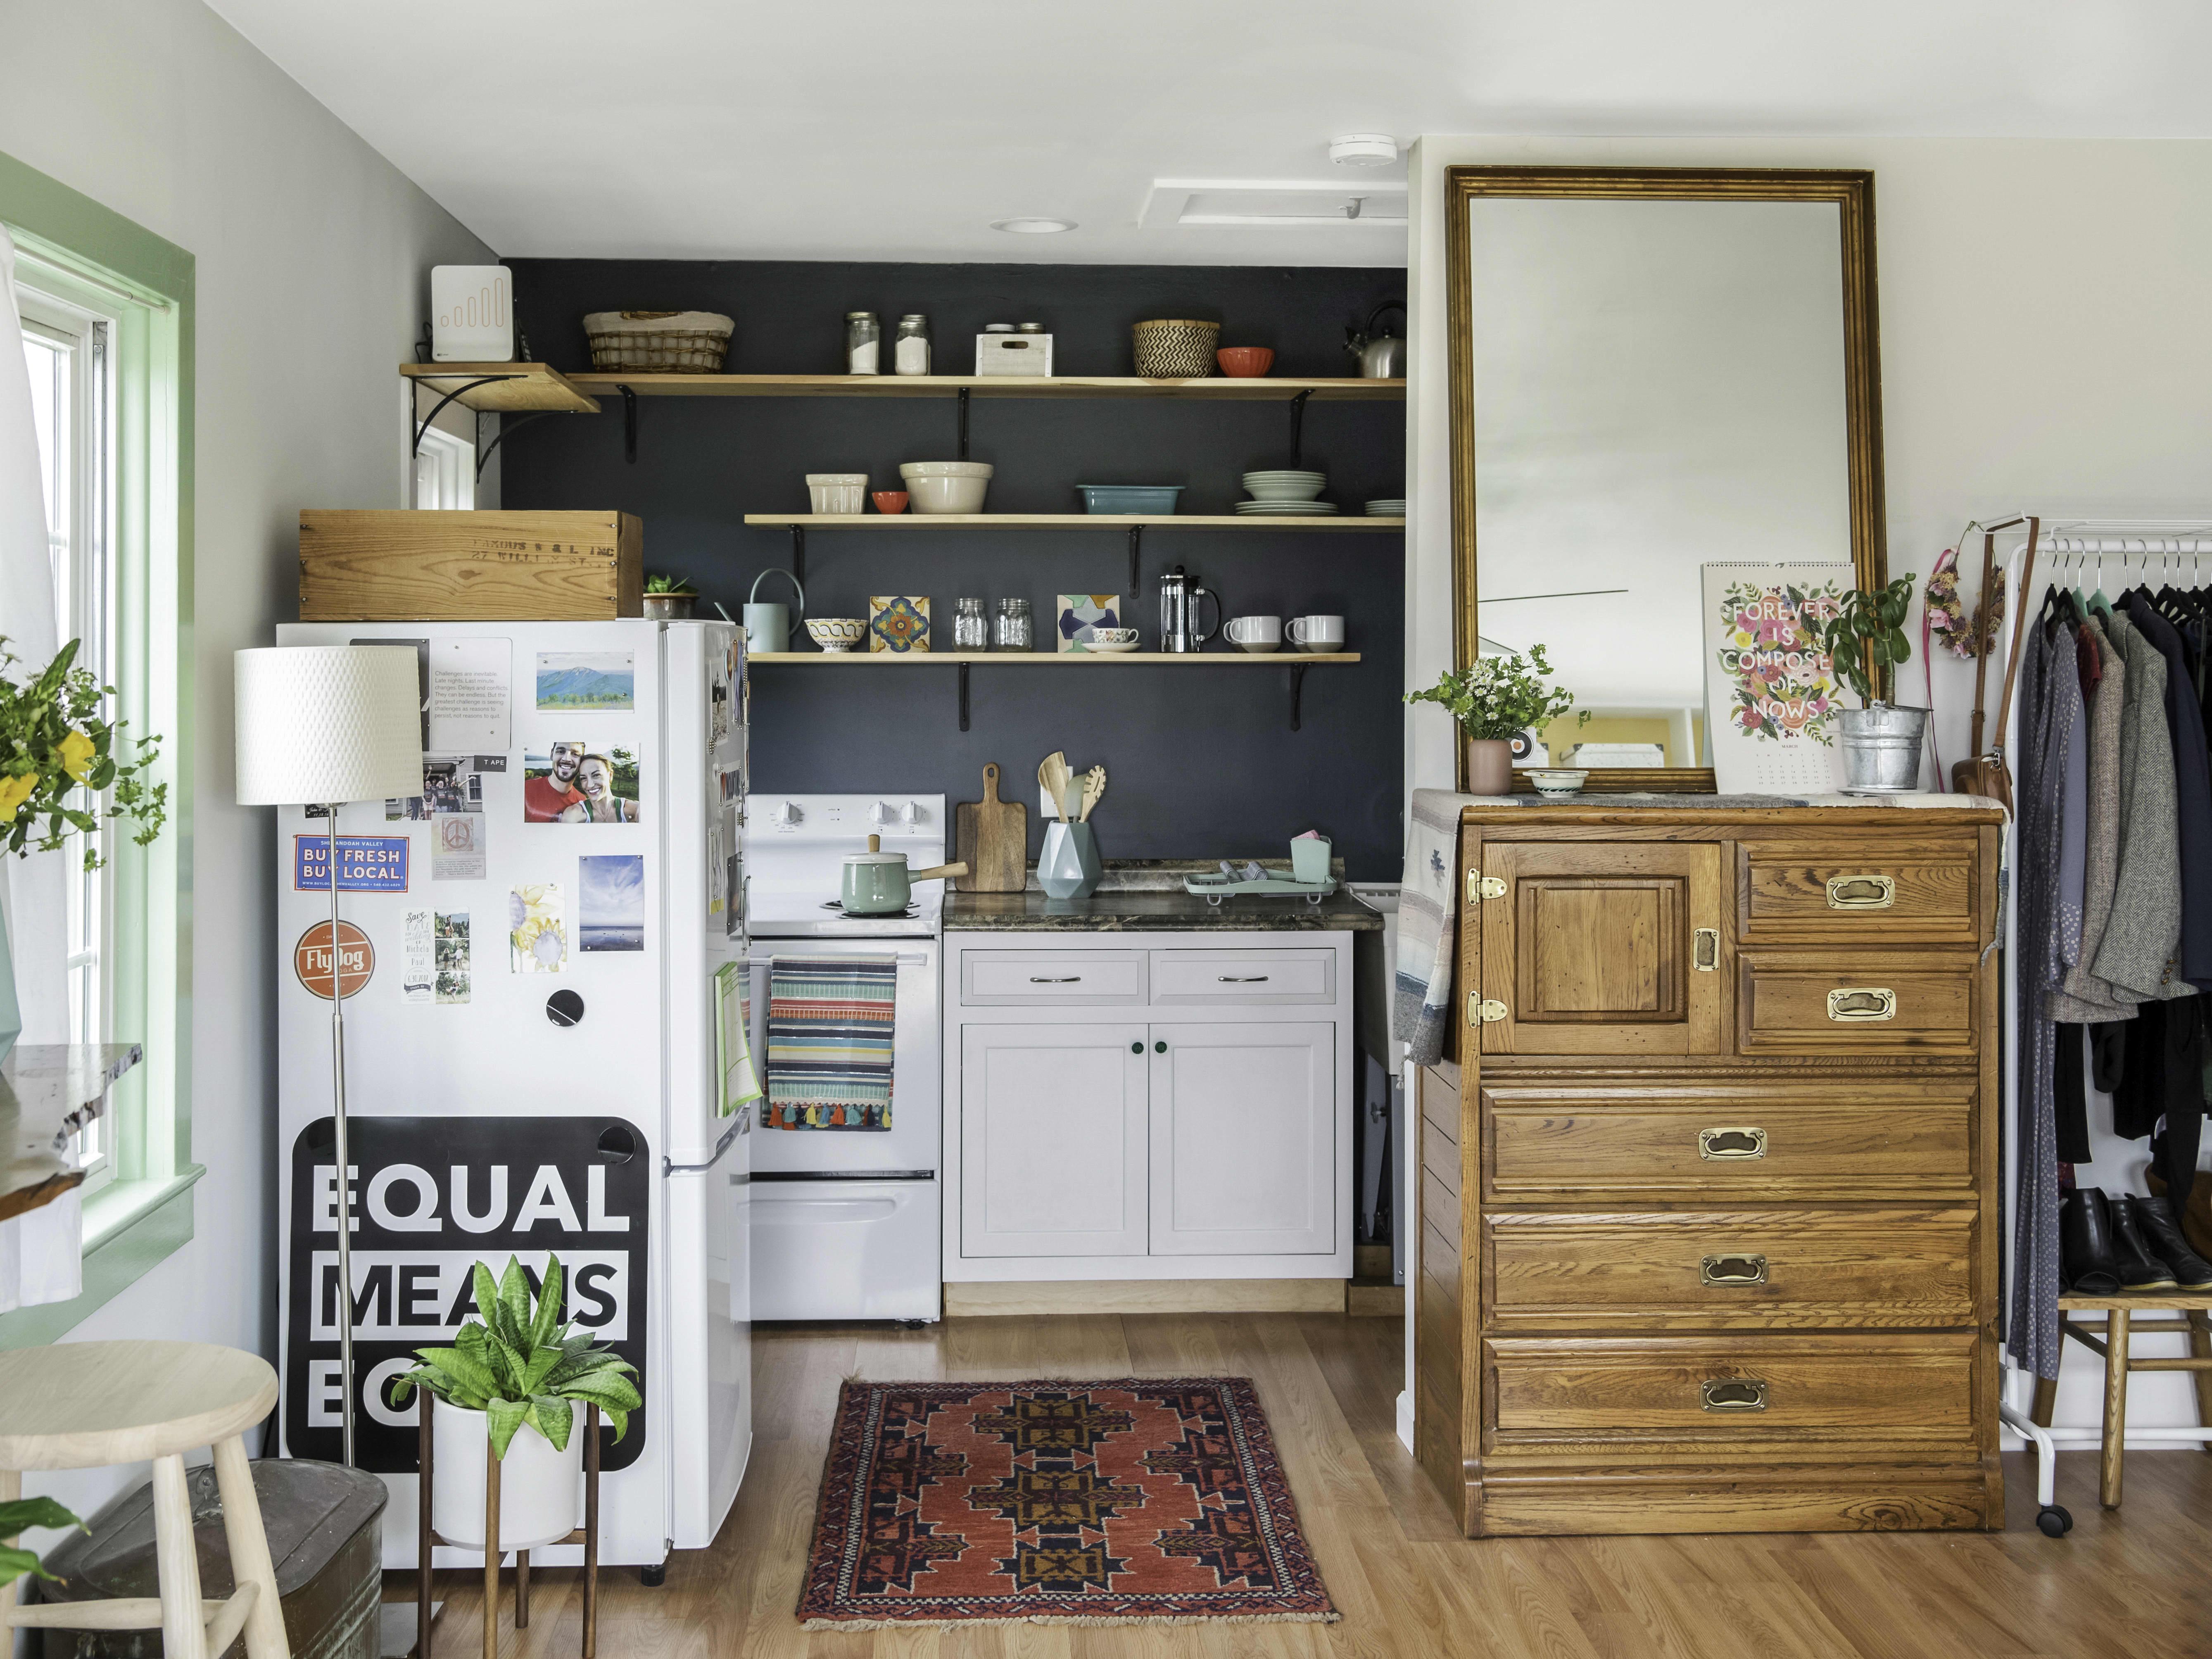 Tremendous Tour A 400 Square Foot Tiny House That Got A Big Color Home Interior And Landscaping Ologienasavecom